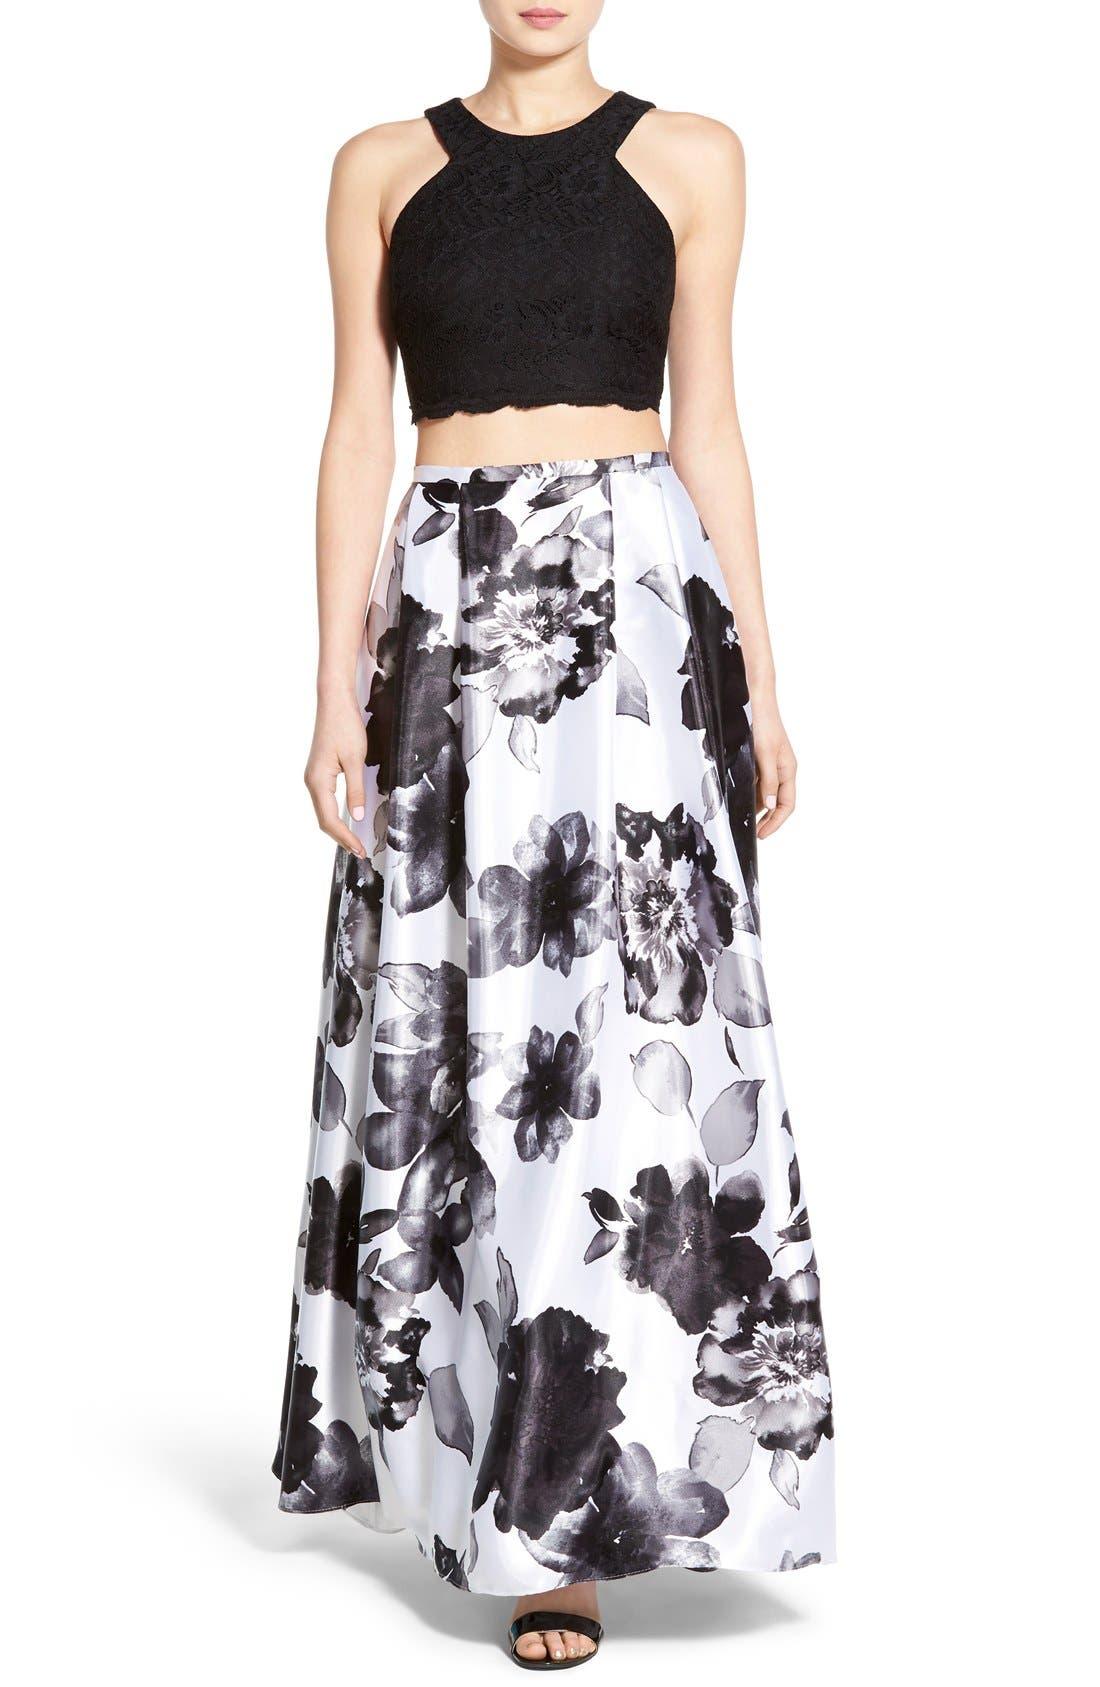 Alternate Image 1 Selected - Blondie Nites Floral Print Two-Piece Gown